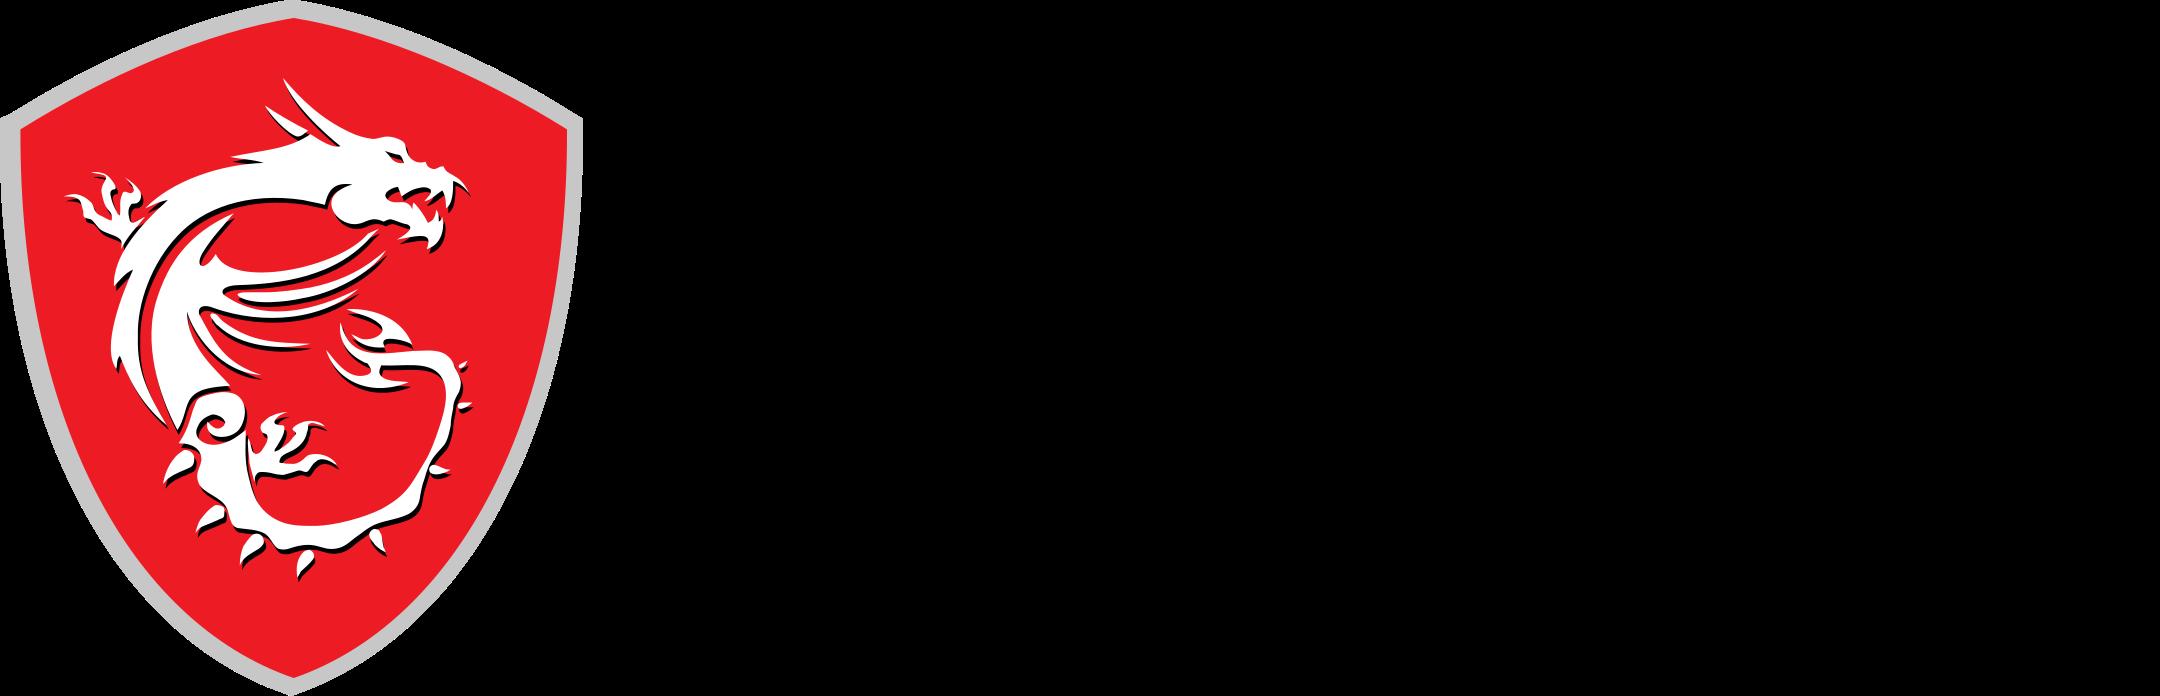 msi logo 1 1 - MSI Logo